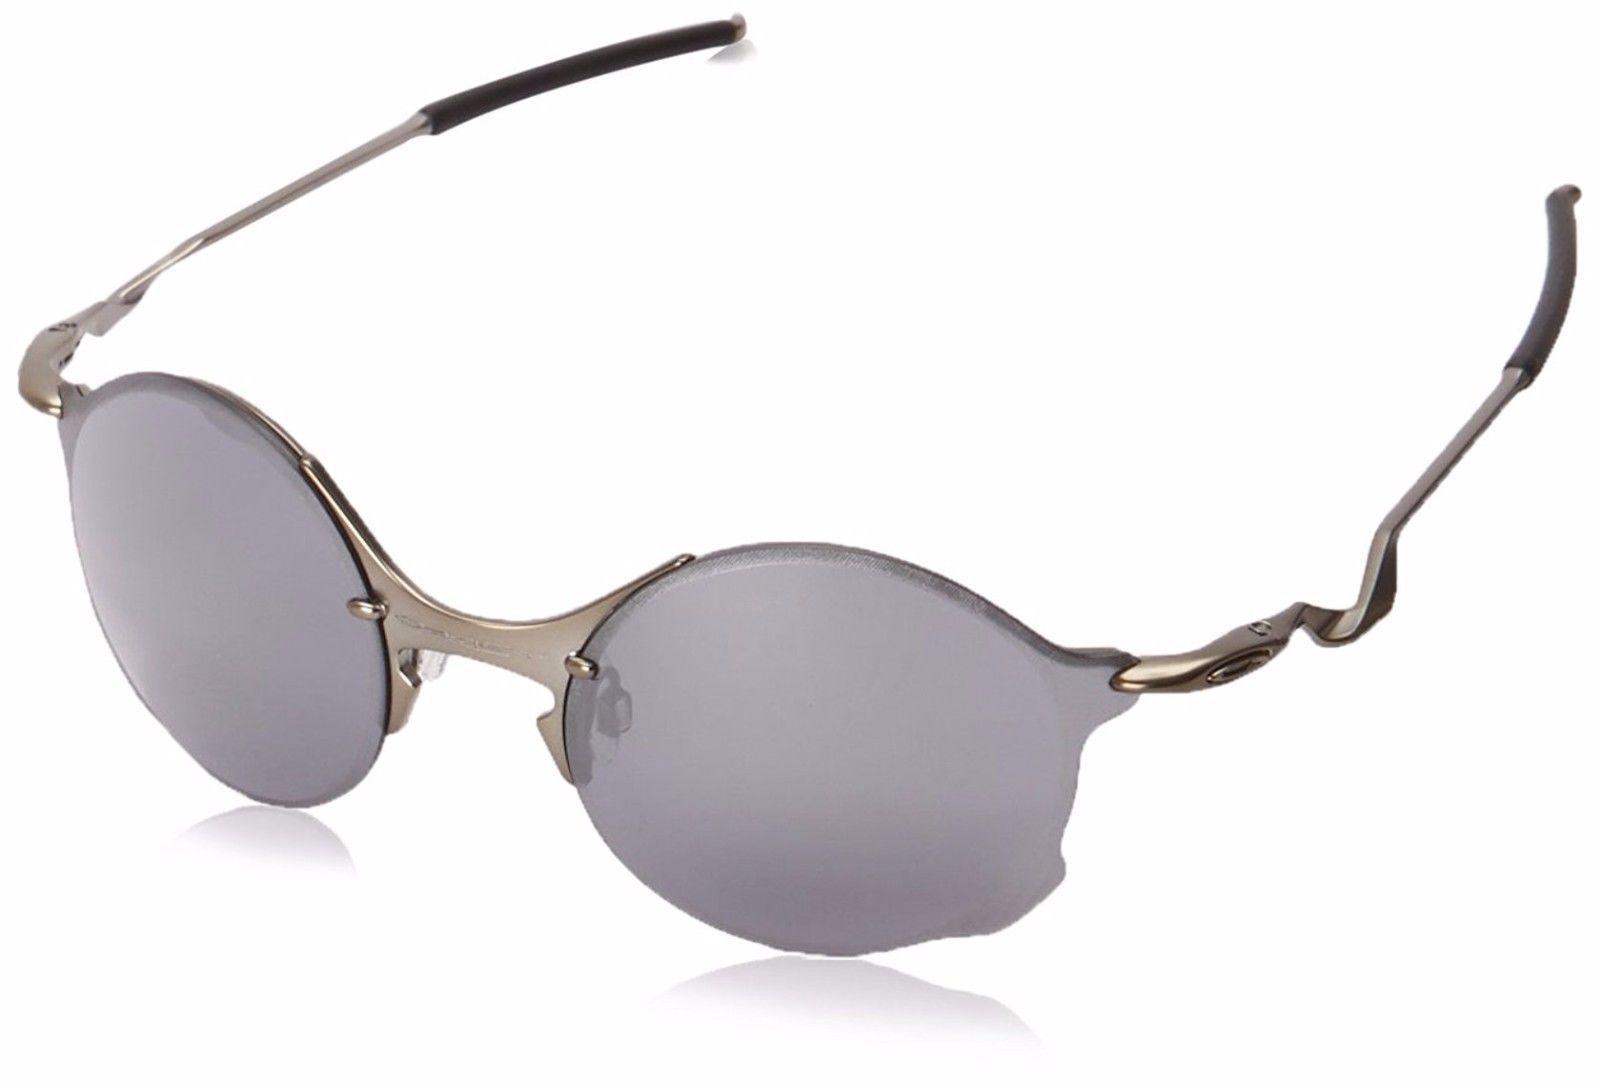 48d2bb550318e Sol · New OAKLEY TAILEND - Titanium Frame w  Black Iridium Lens Sunglasses  OO4088-01 Óculos